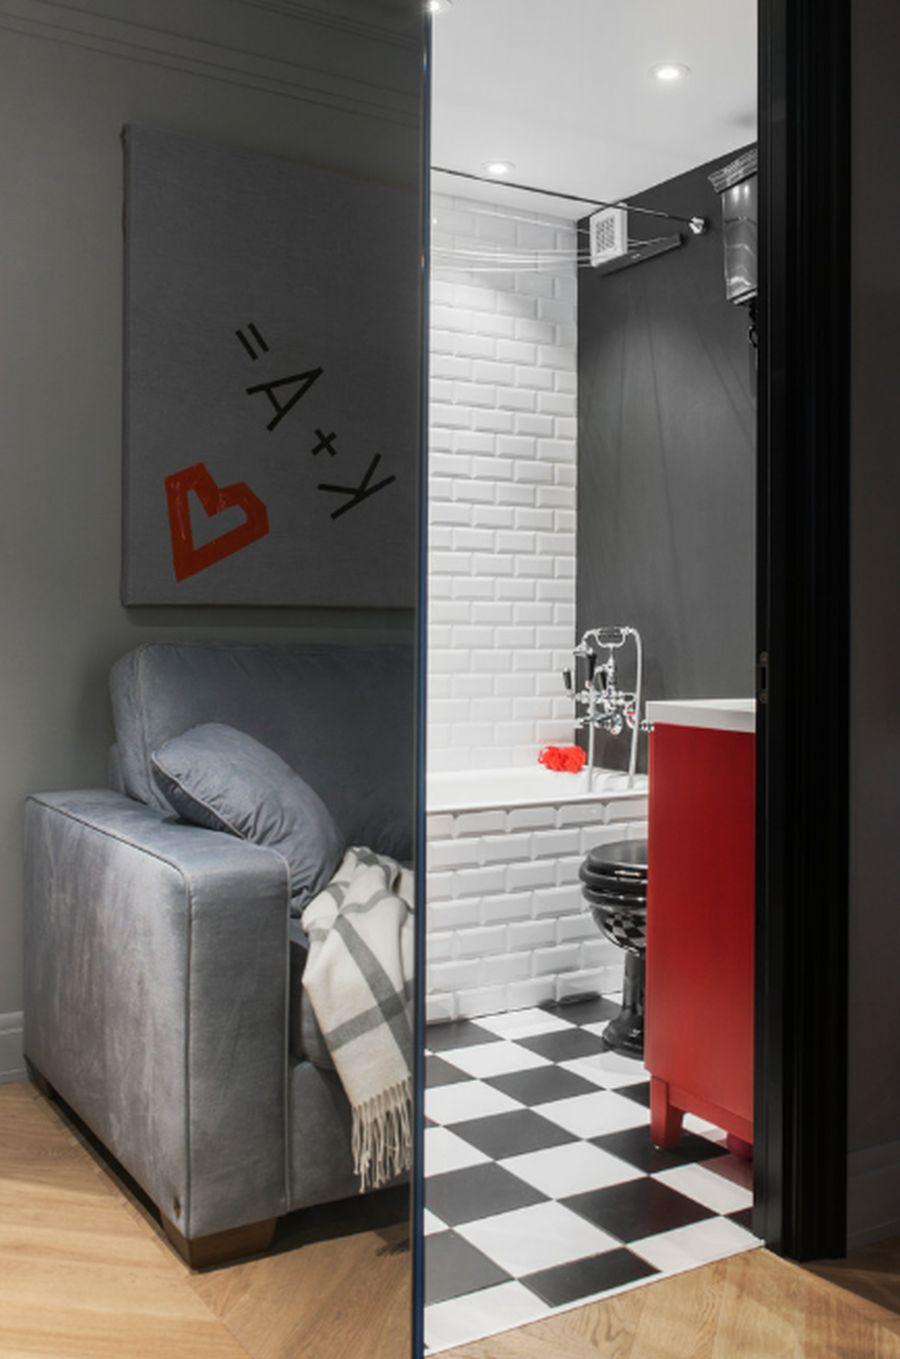 adelaparvu-com-despre-reoganizarea-unui-apartament-de-2-camere-in-3-camere-54-mp-designer-masha-kunyakina-foto-olga-melekesceva-10